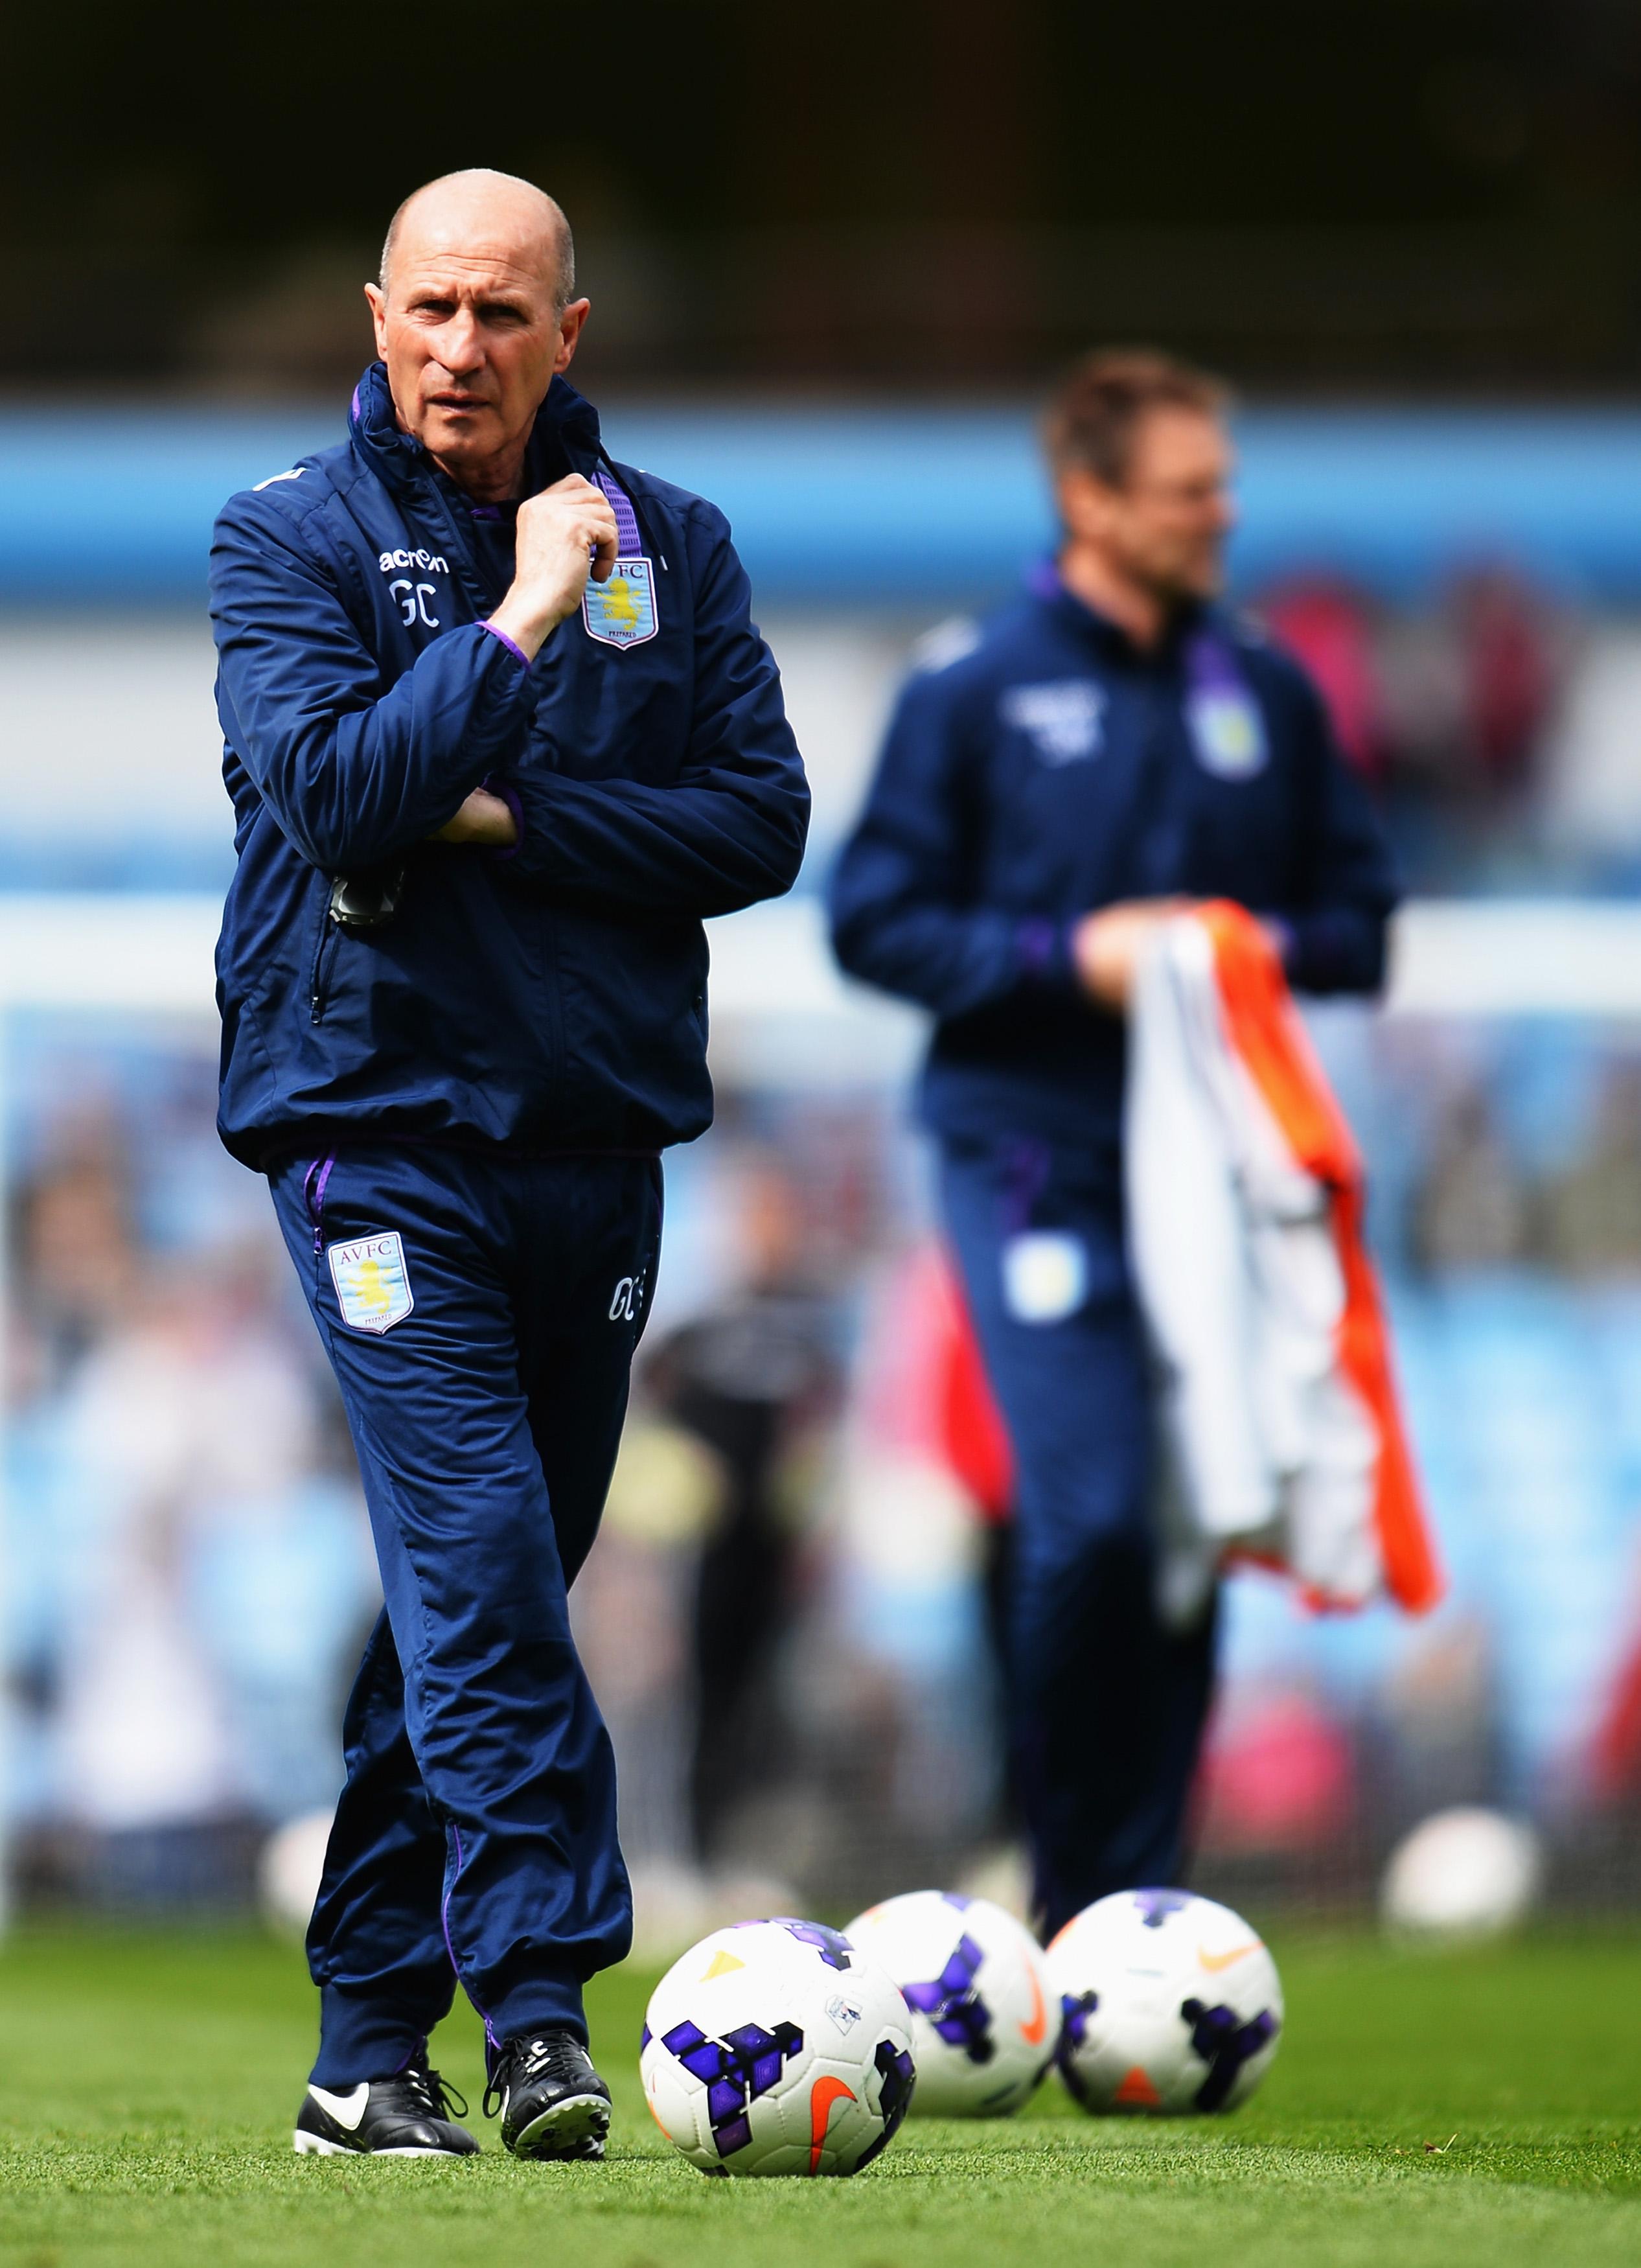 Gordon Cowans' Villa U21 team have won just three times this season.